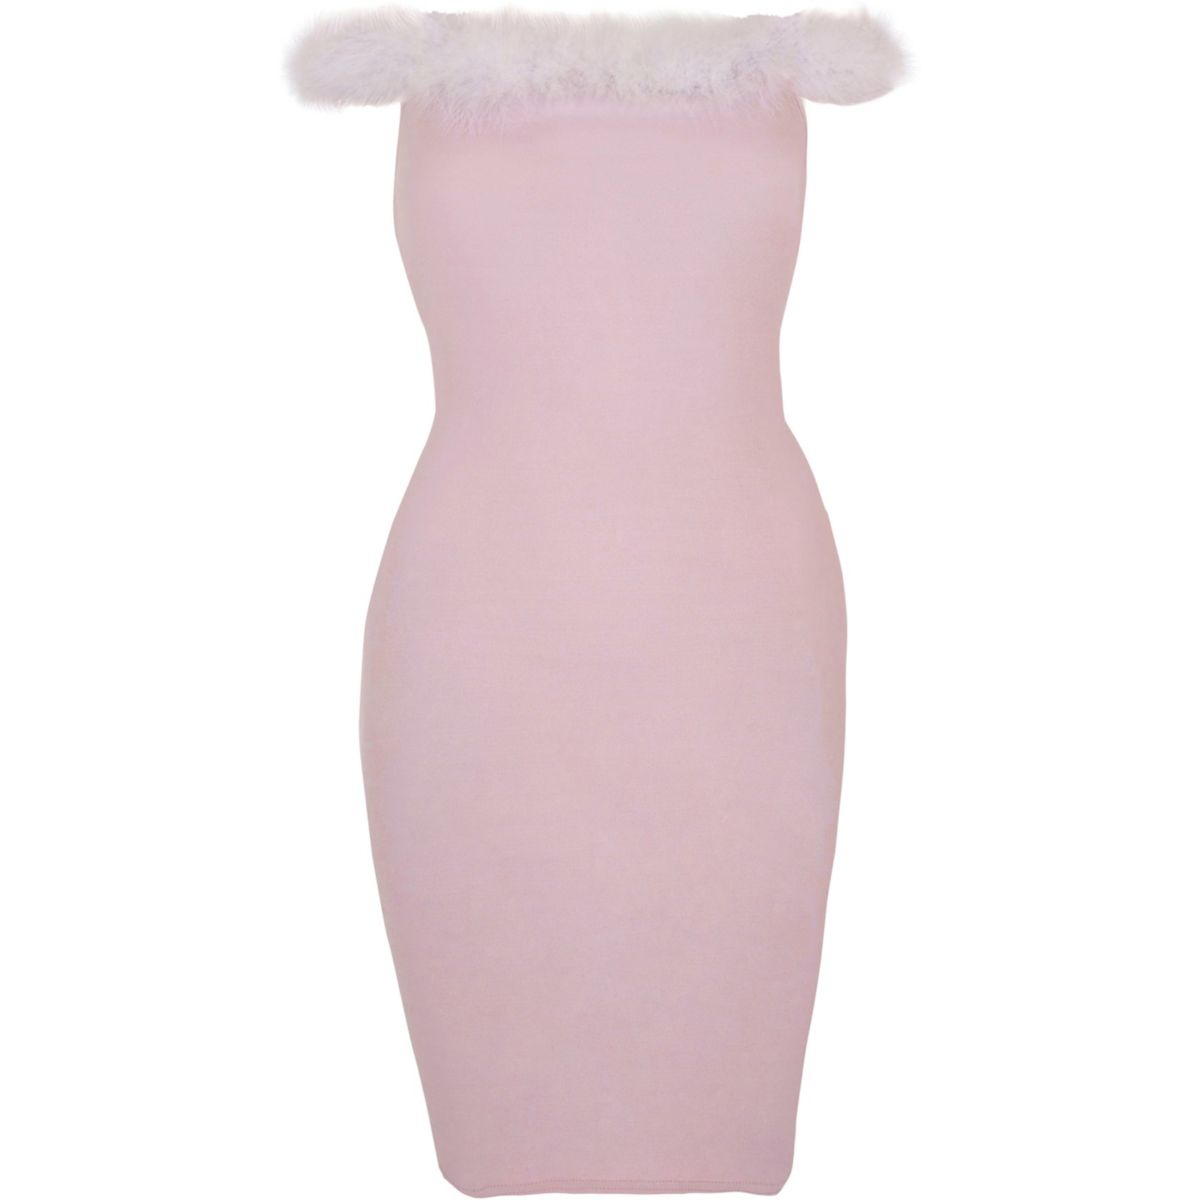 Light pink fluffy trim bardot bodycon dress